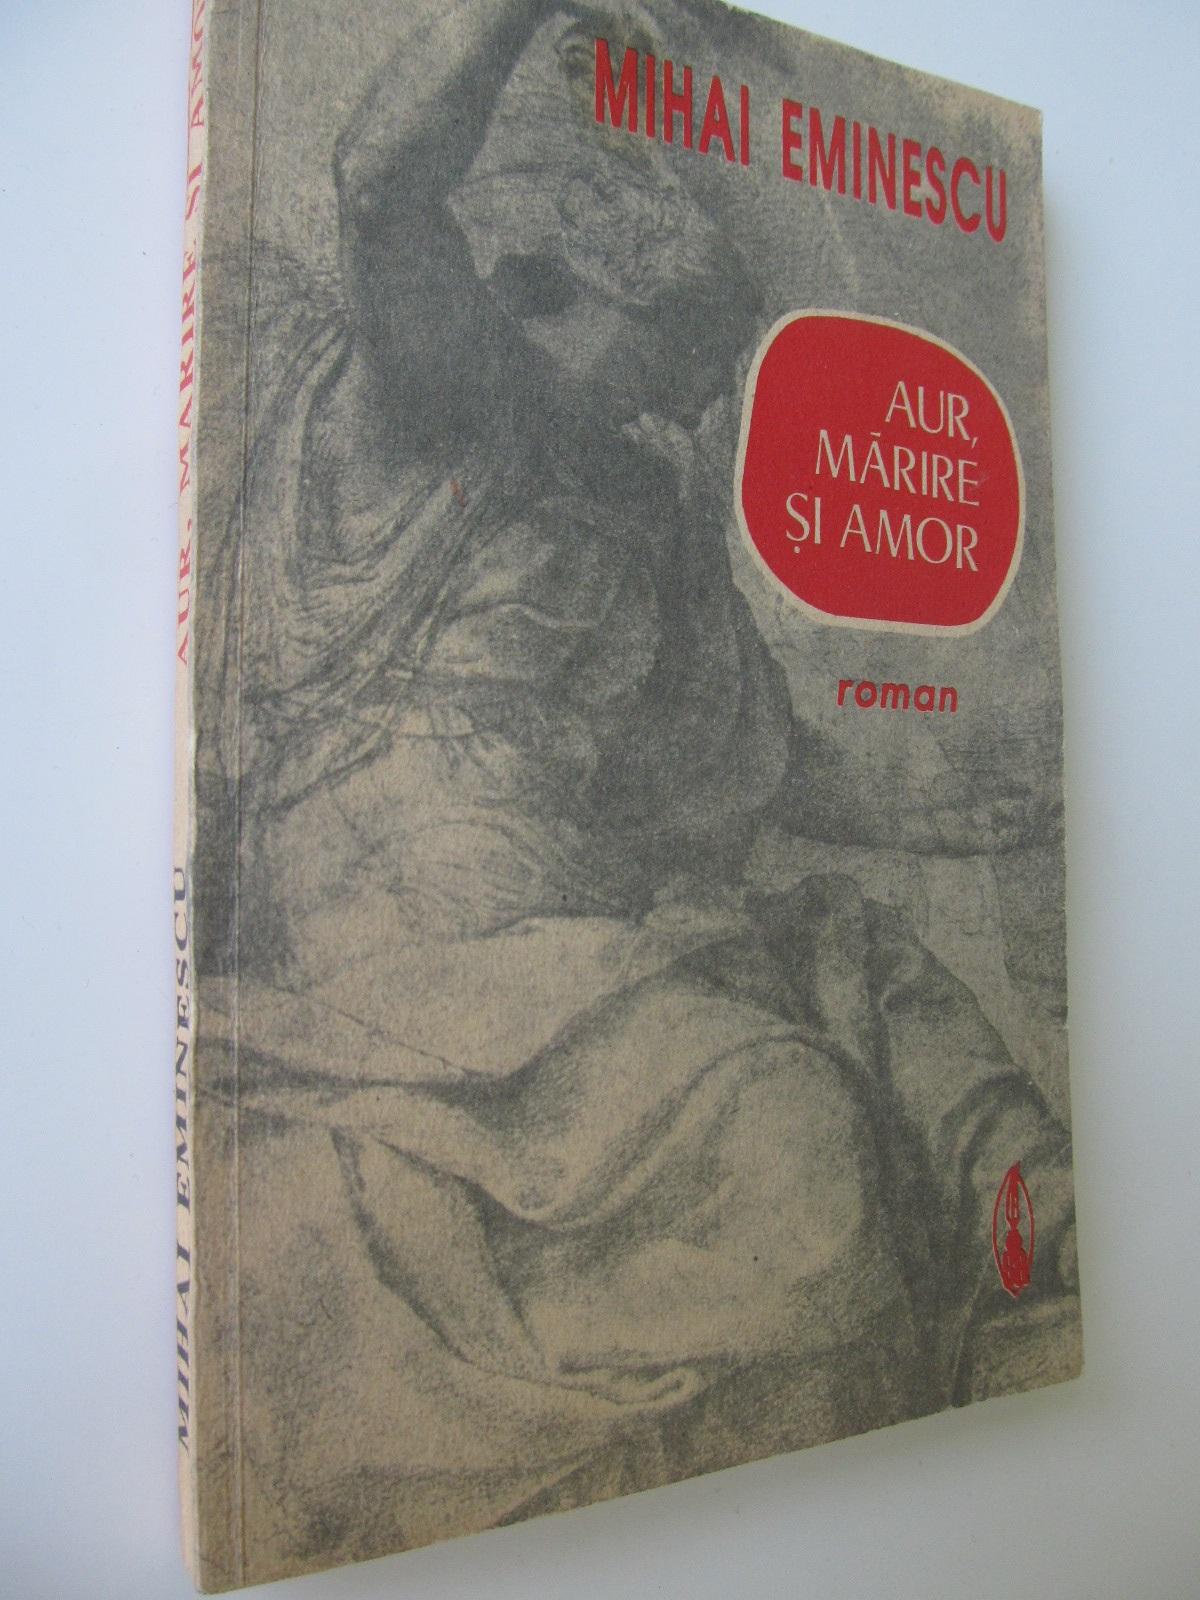 Aur marire si amor - Mihai Eminescu | Detalii carte